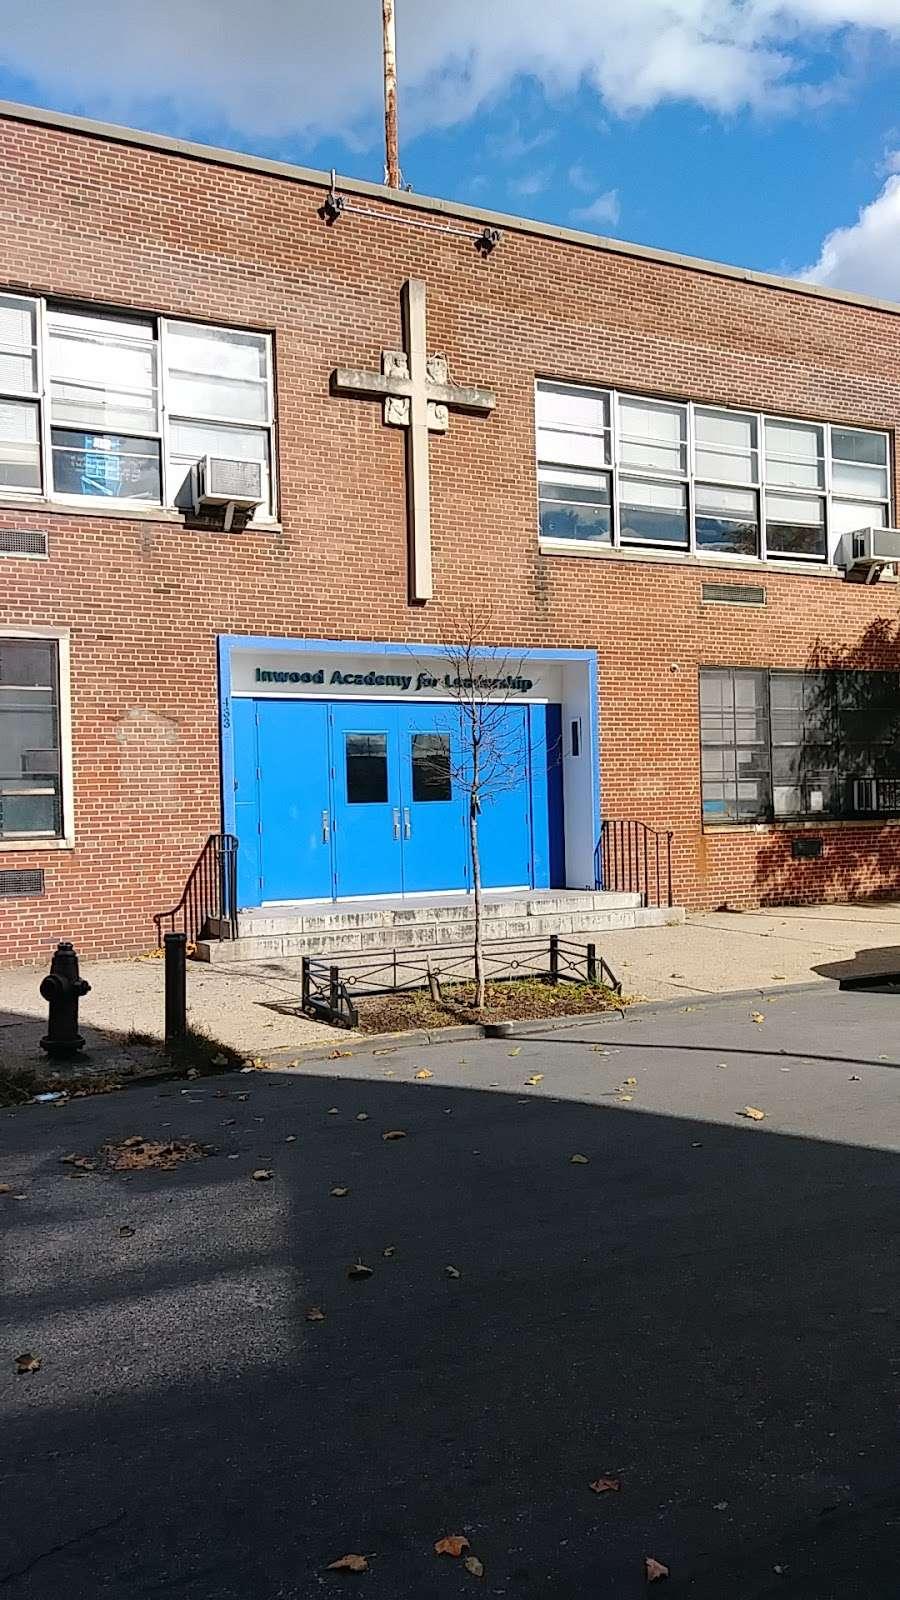 Inwood Academy for Leadership Charter School - school  | Photo 1 of 10 | Address: 433 W 204th St, New York, NY 10034, USA | Phone: (646) 665-5570